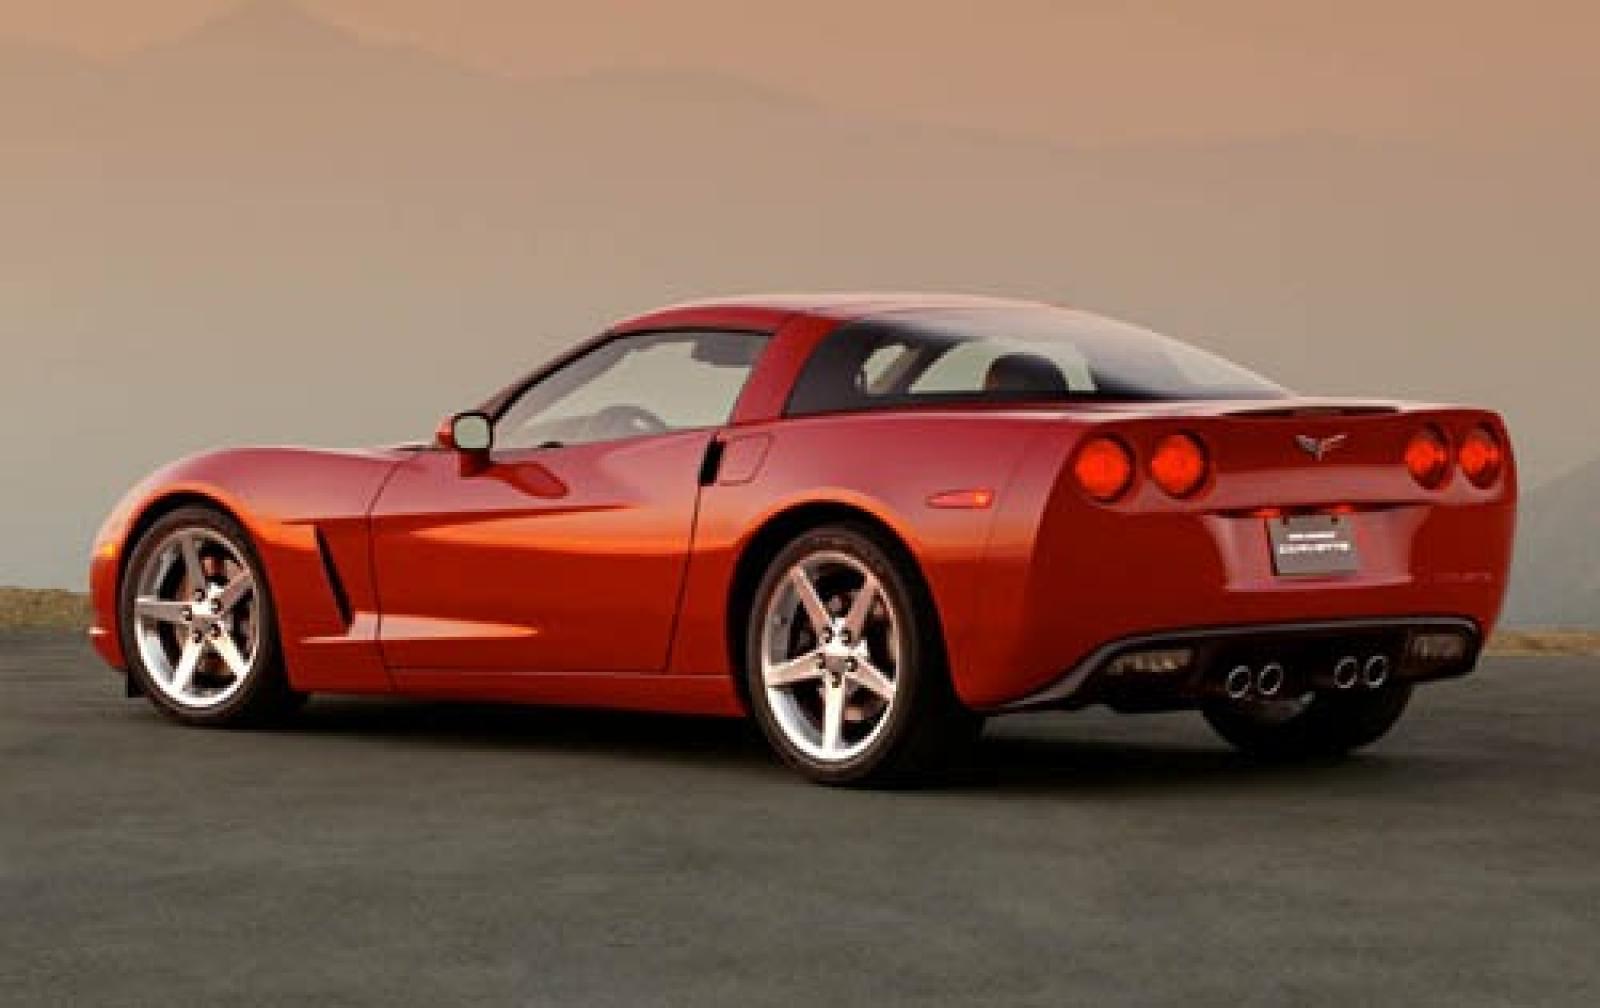 2006 chevrolet corvette z exterior 8 800 1024 1280 1600 origin